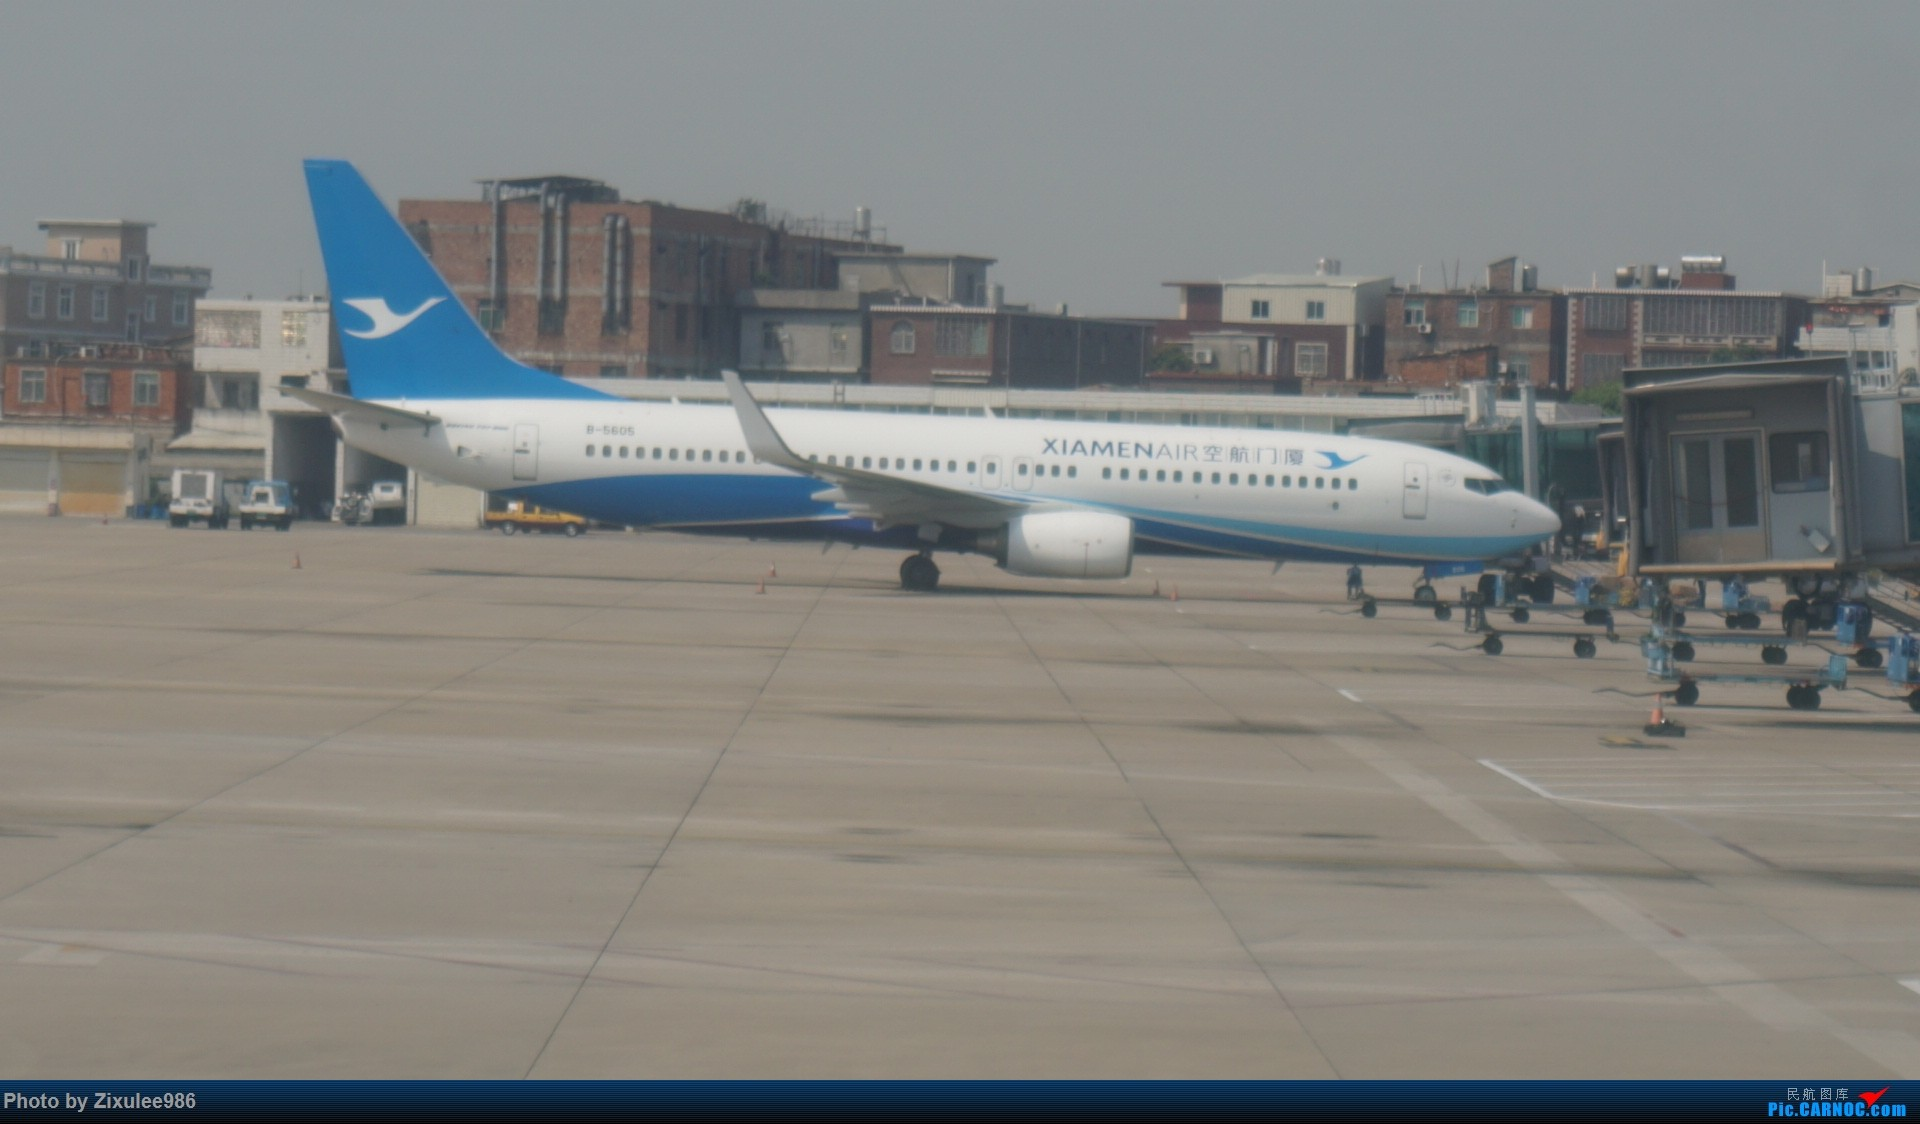 Re:[原创]加拿大21日游学之旅(一)~JJN-PVG-YYZ..(内含flightlog)~第一次发游记~多图缓更请谅解 BOEING 737-800 B-5605 中国泉州晋江国际机场